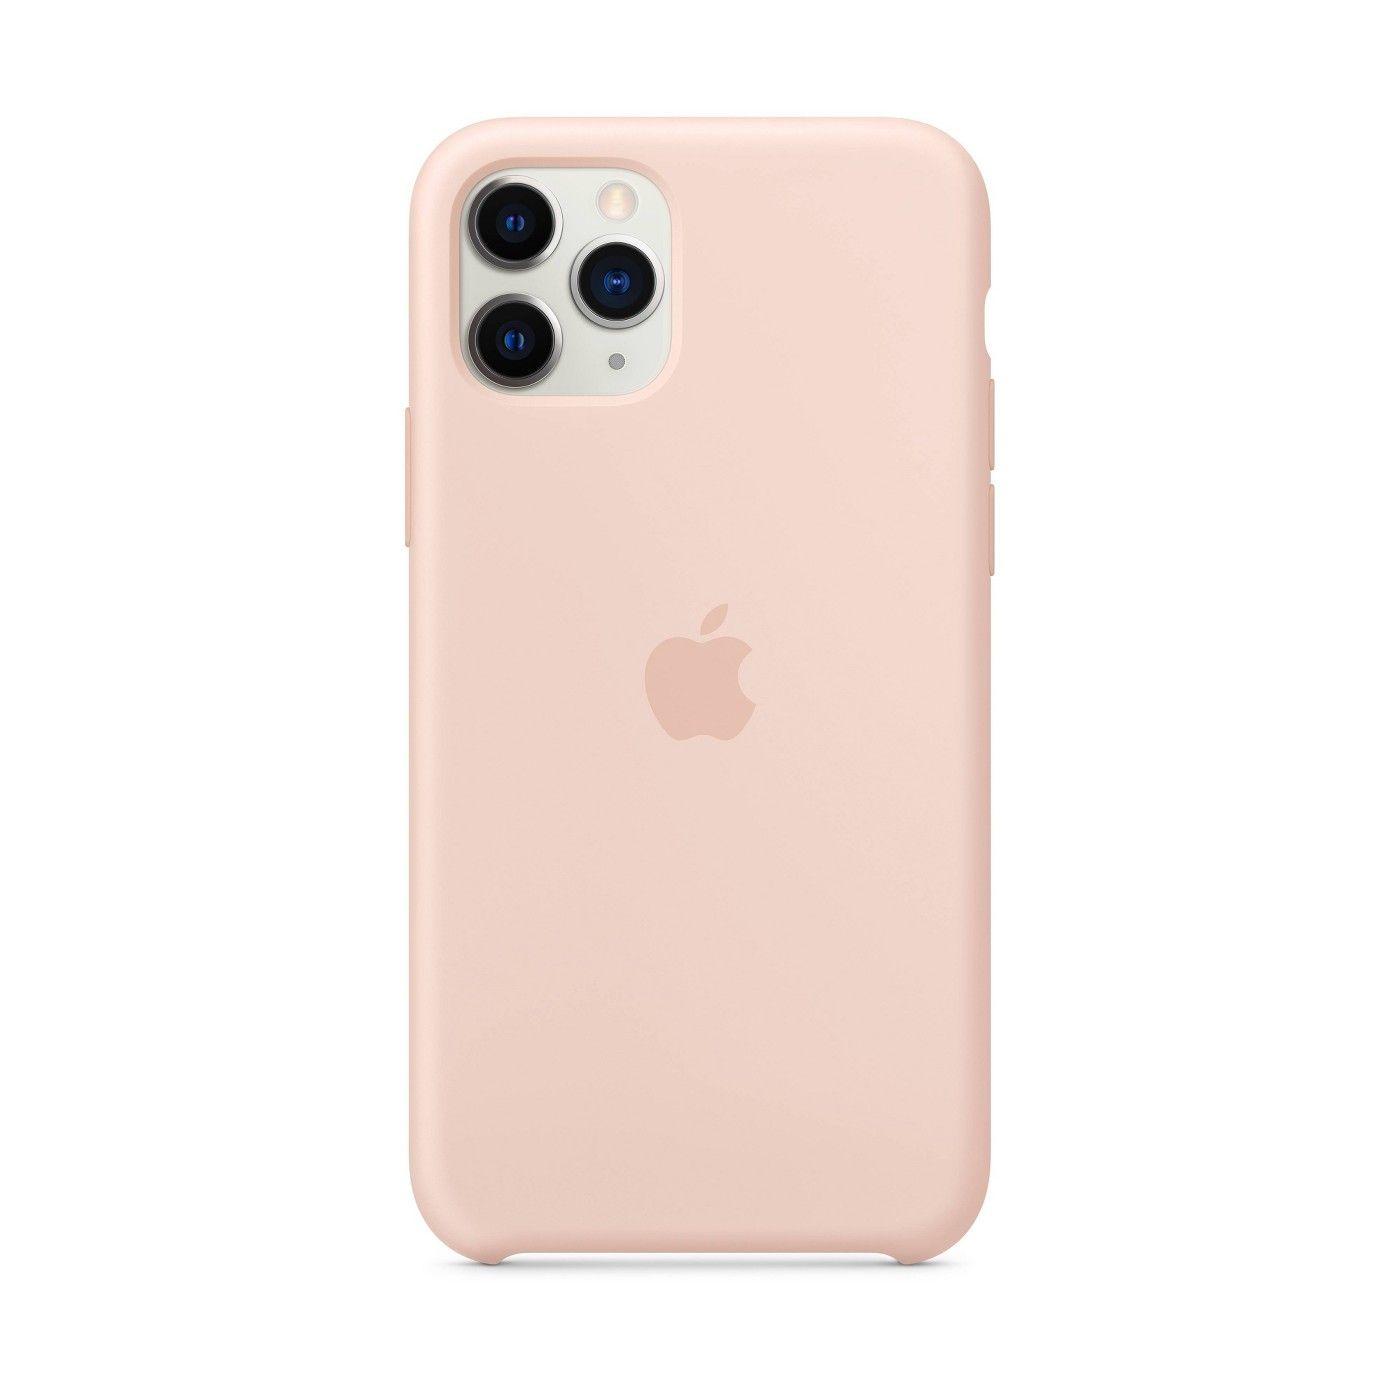 Apple Iphone 11 Pro Silicone Case Iphone Apple Iphone Silicone Iphone Cases